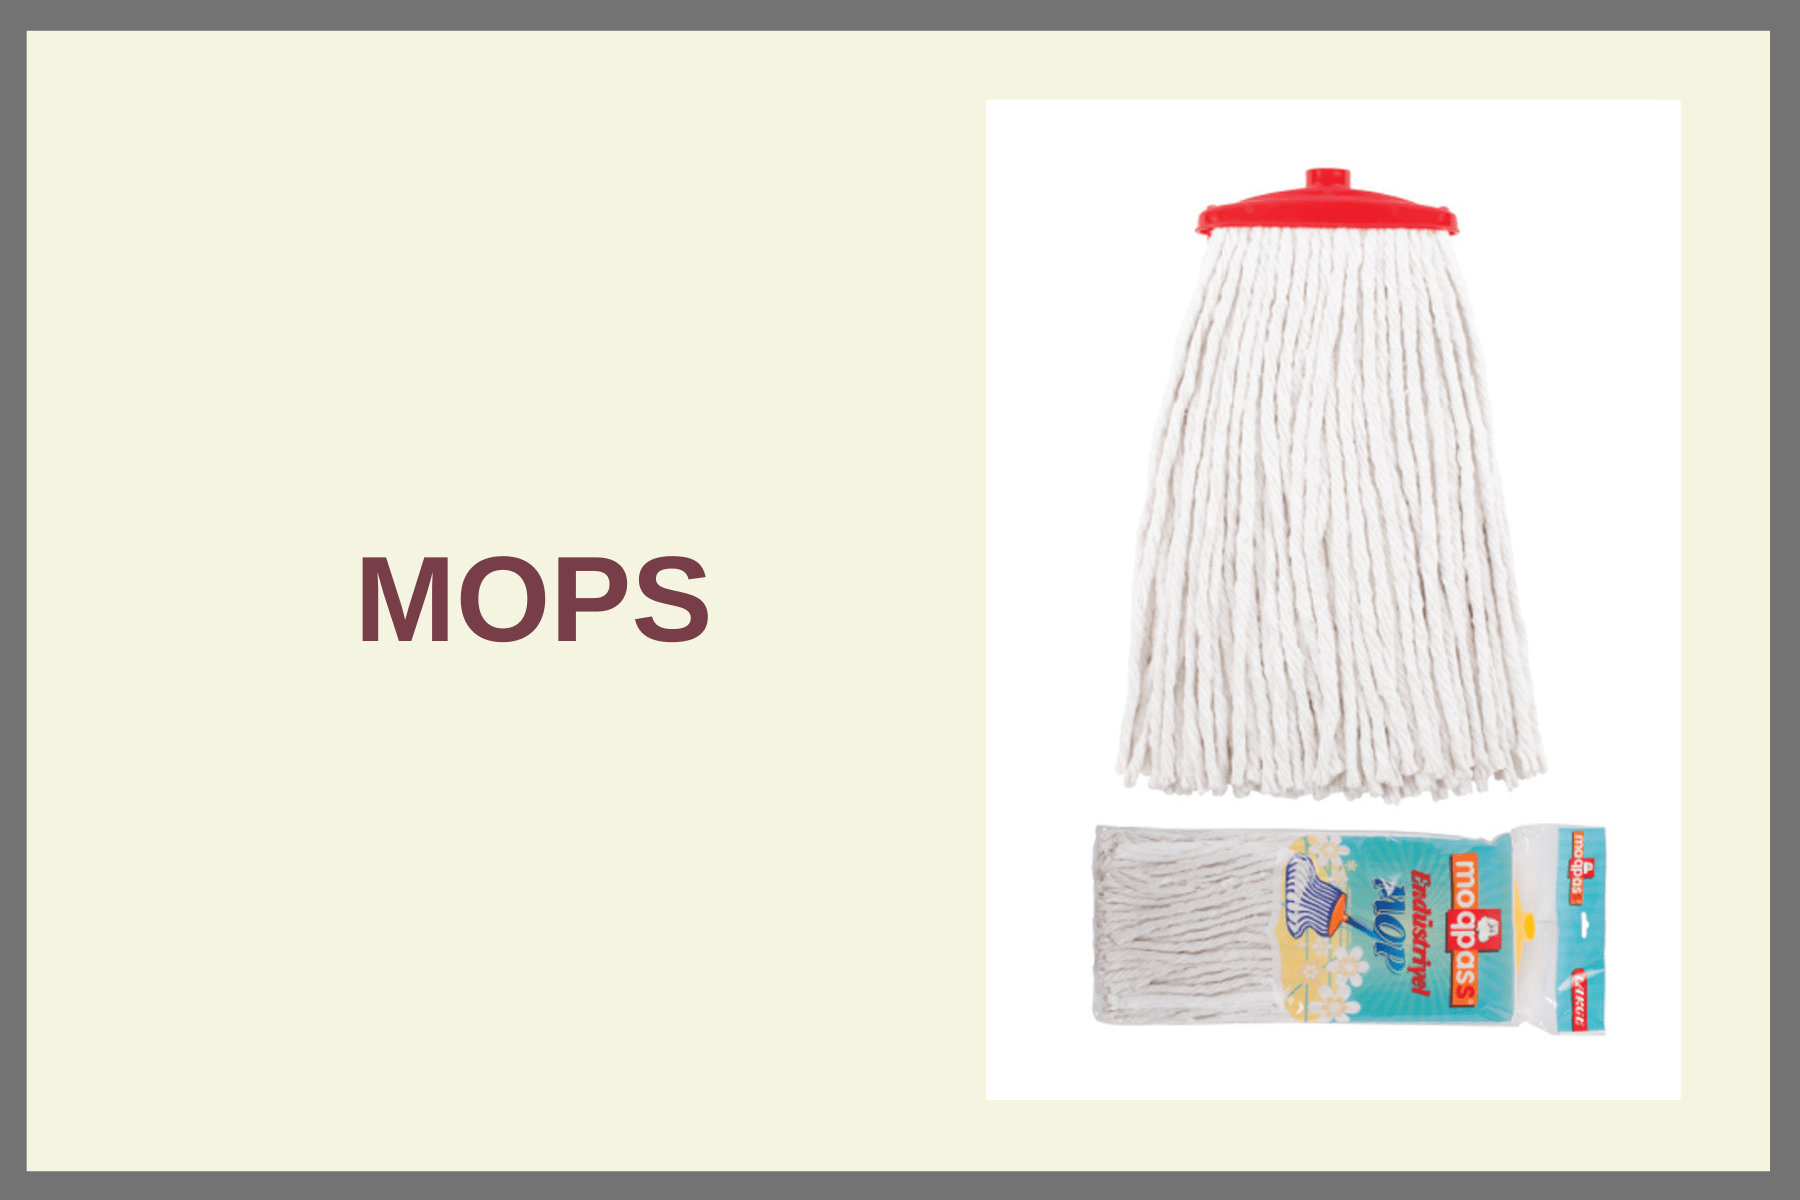 mop mops kentucky exel clean cleaning cleaner household floor fregona mopp haushalt